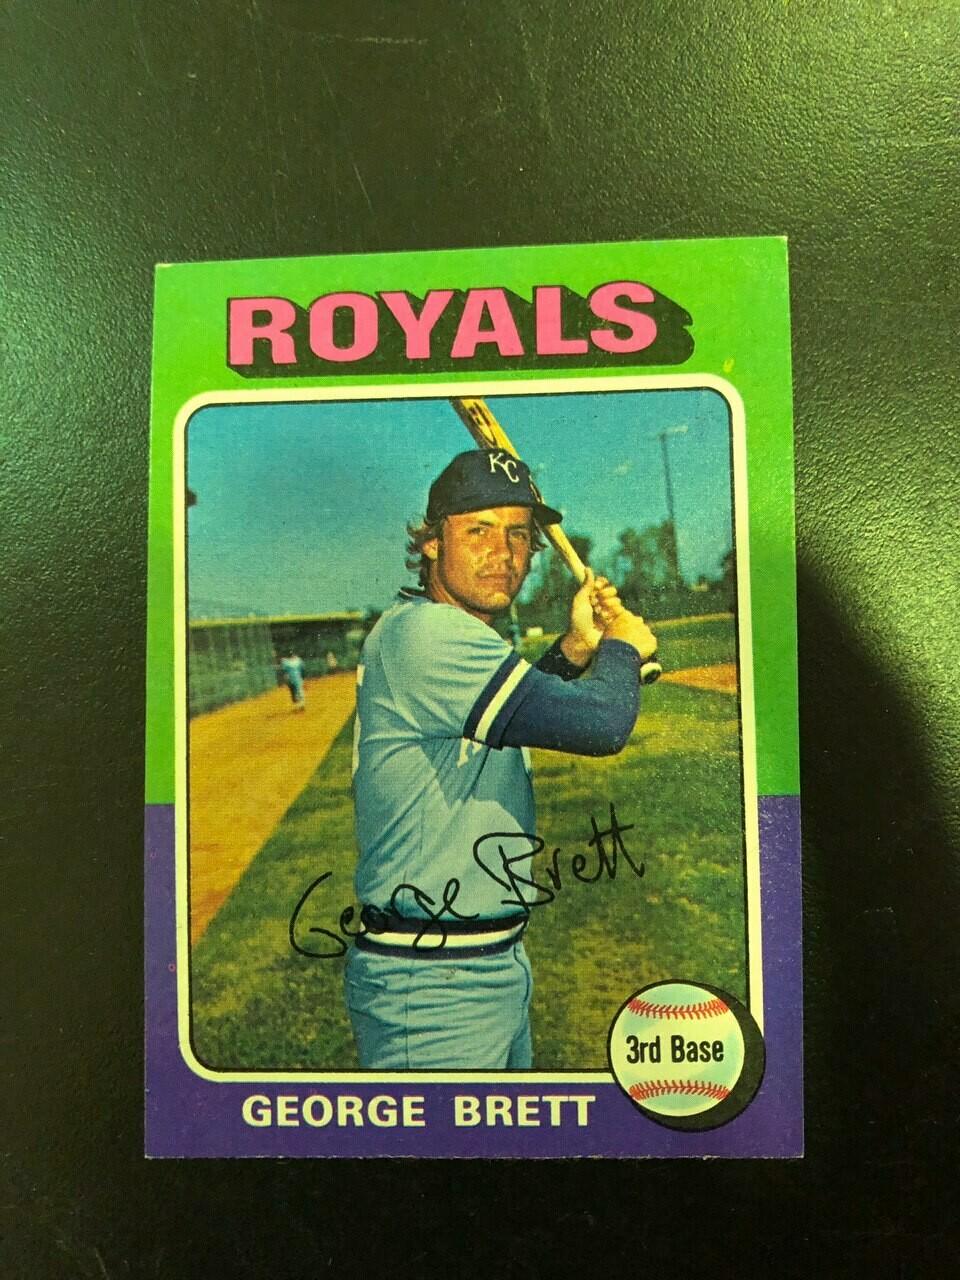 1975 Topps #228 George Brett rookie, $100